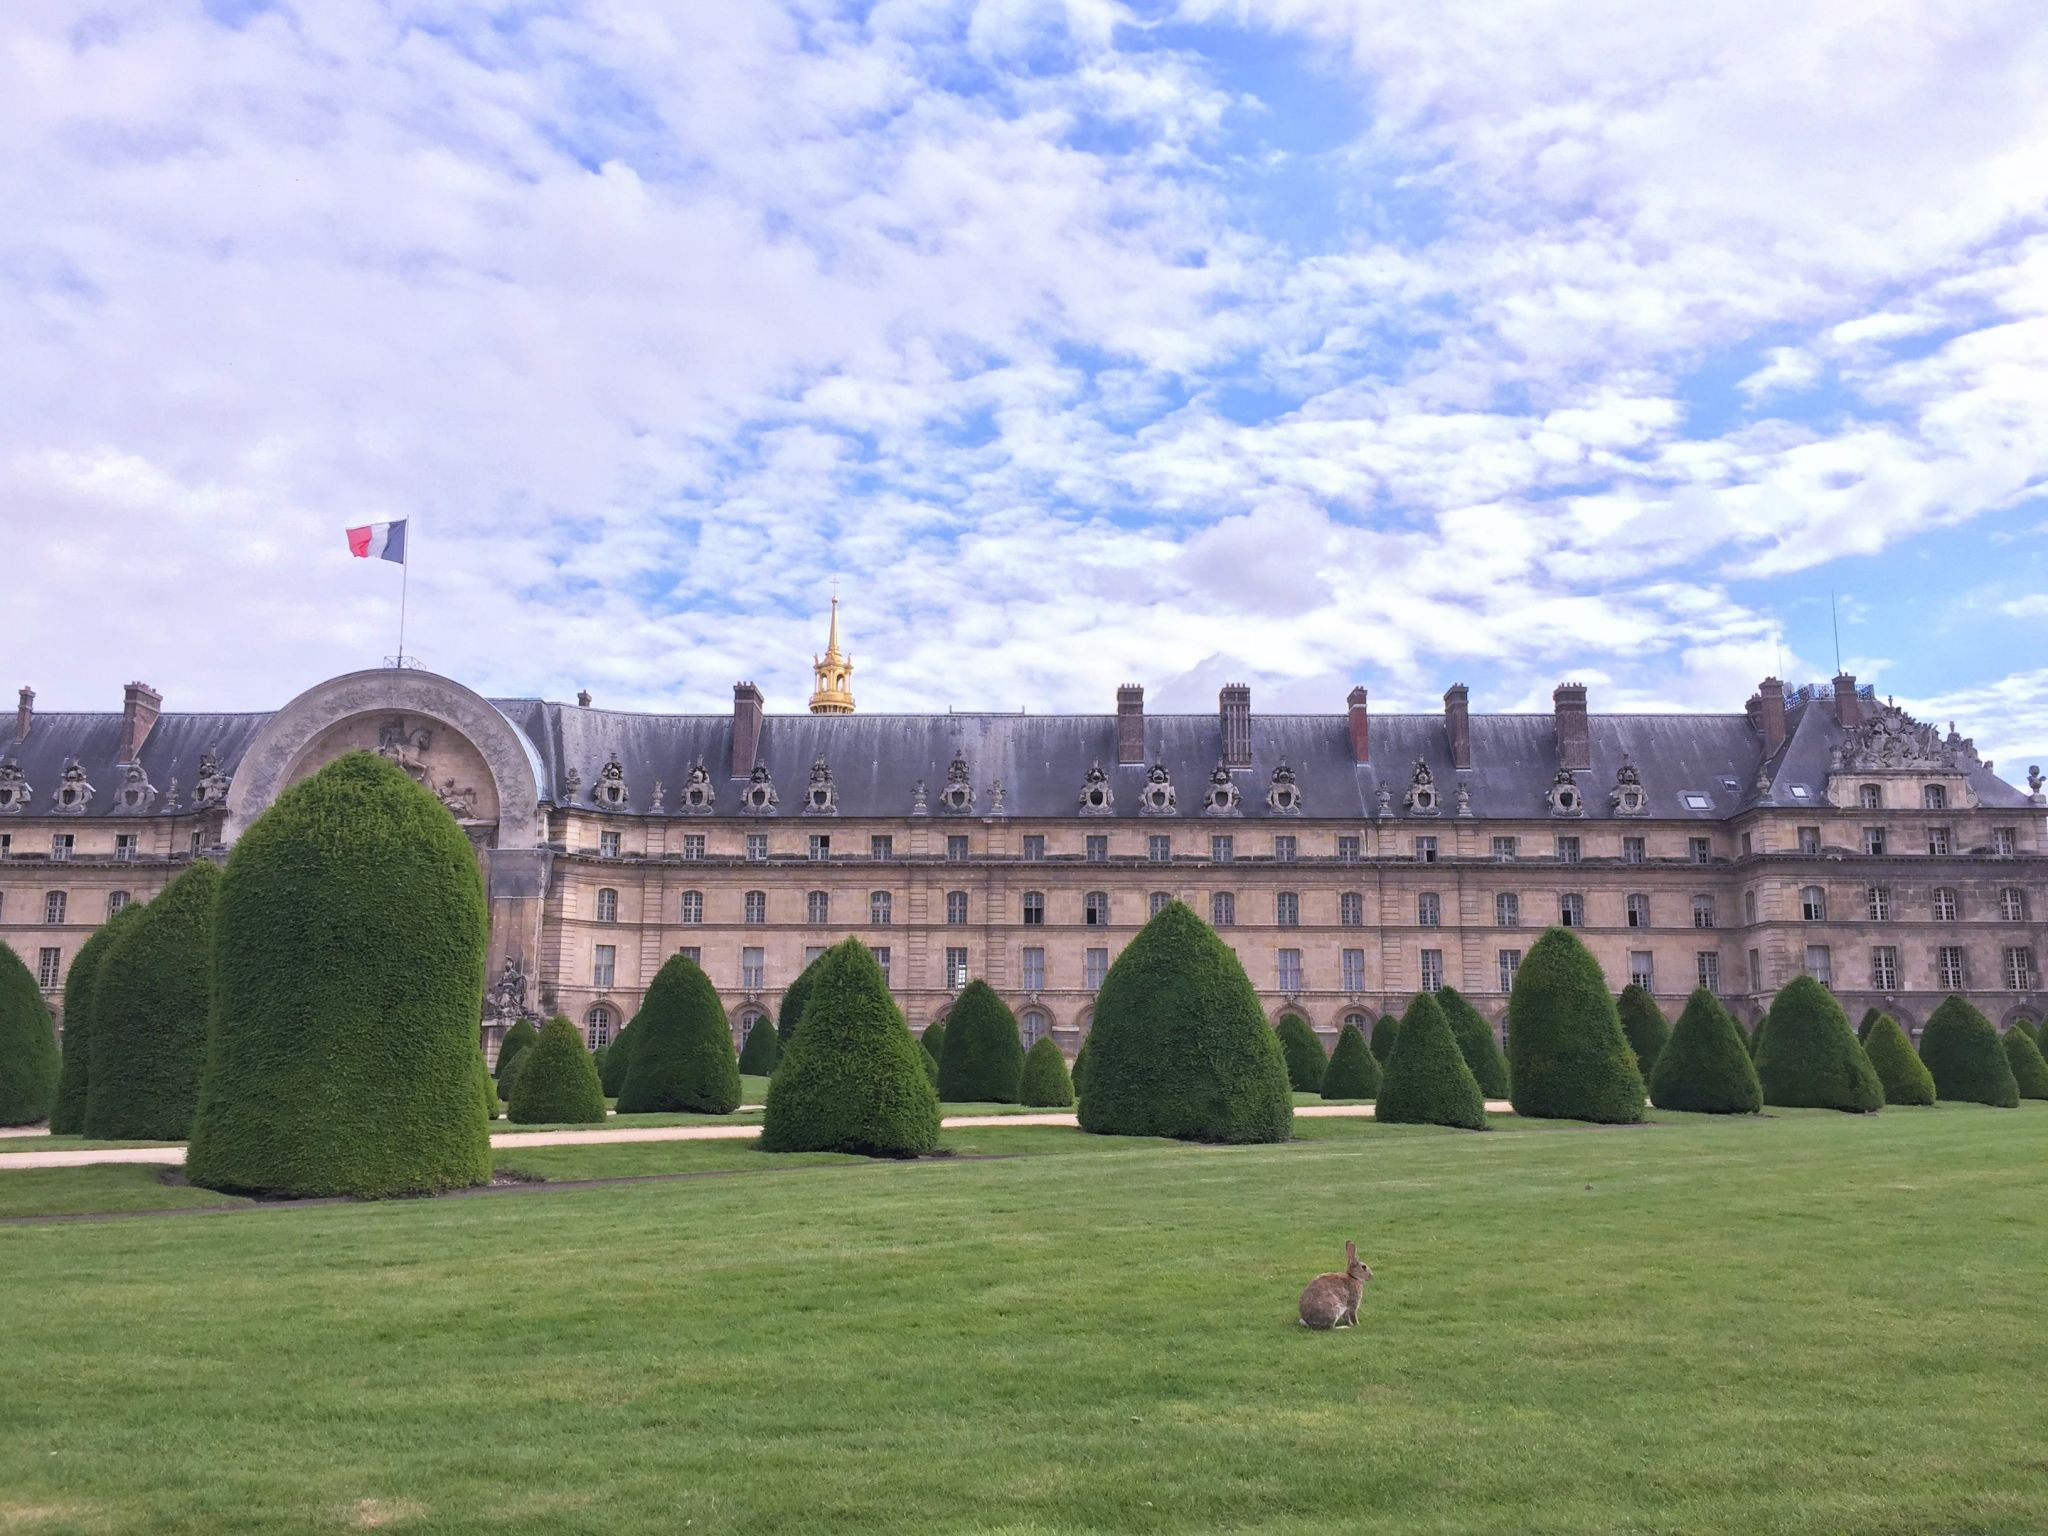 Musee de l'armee, France